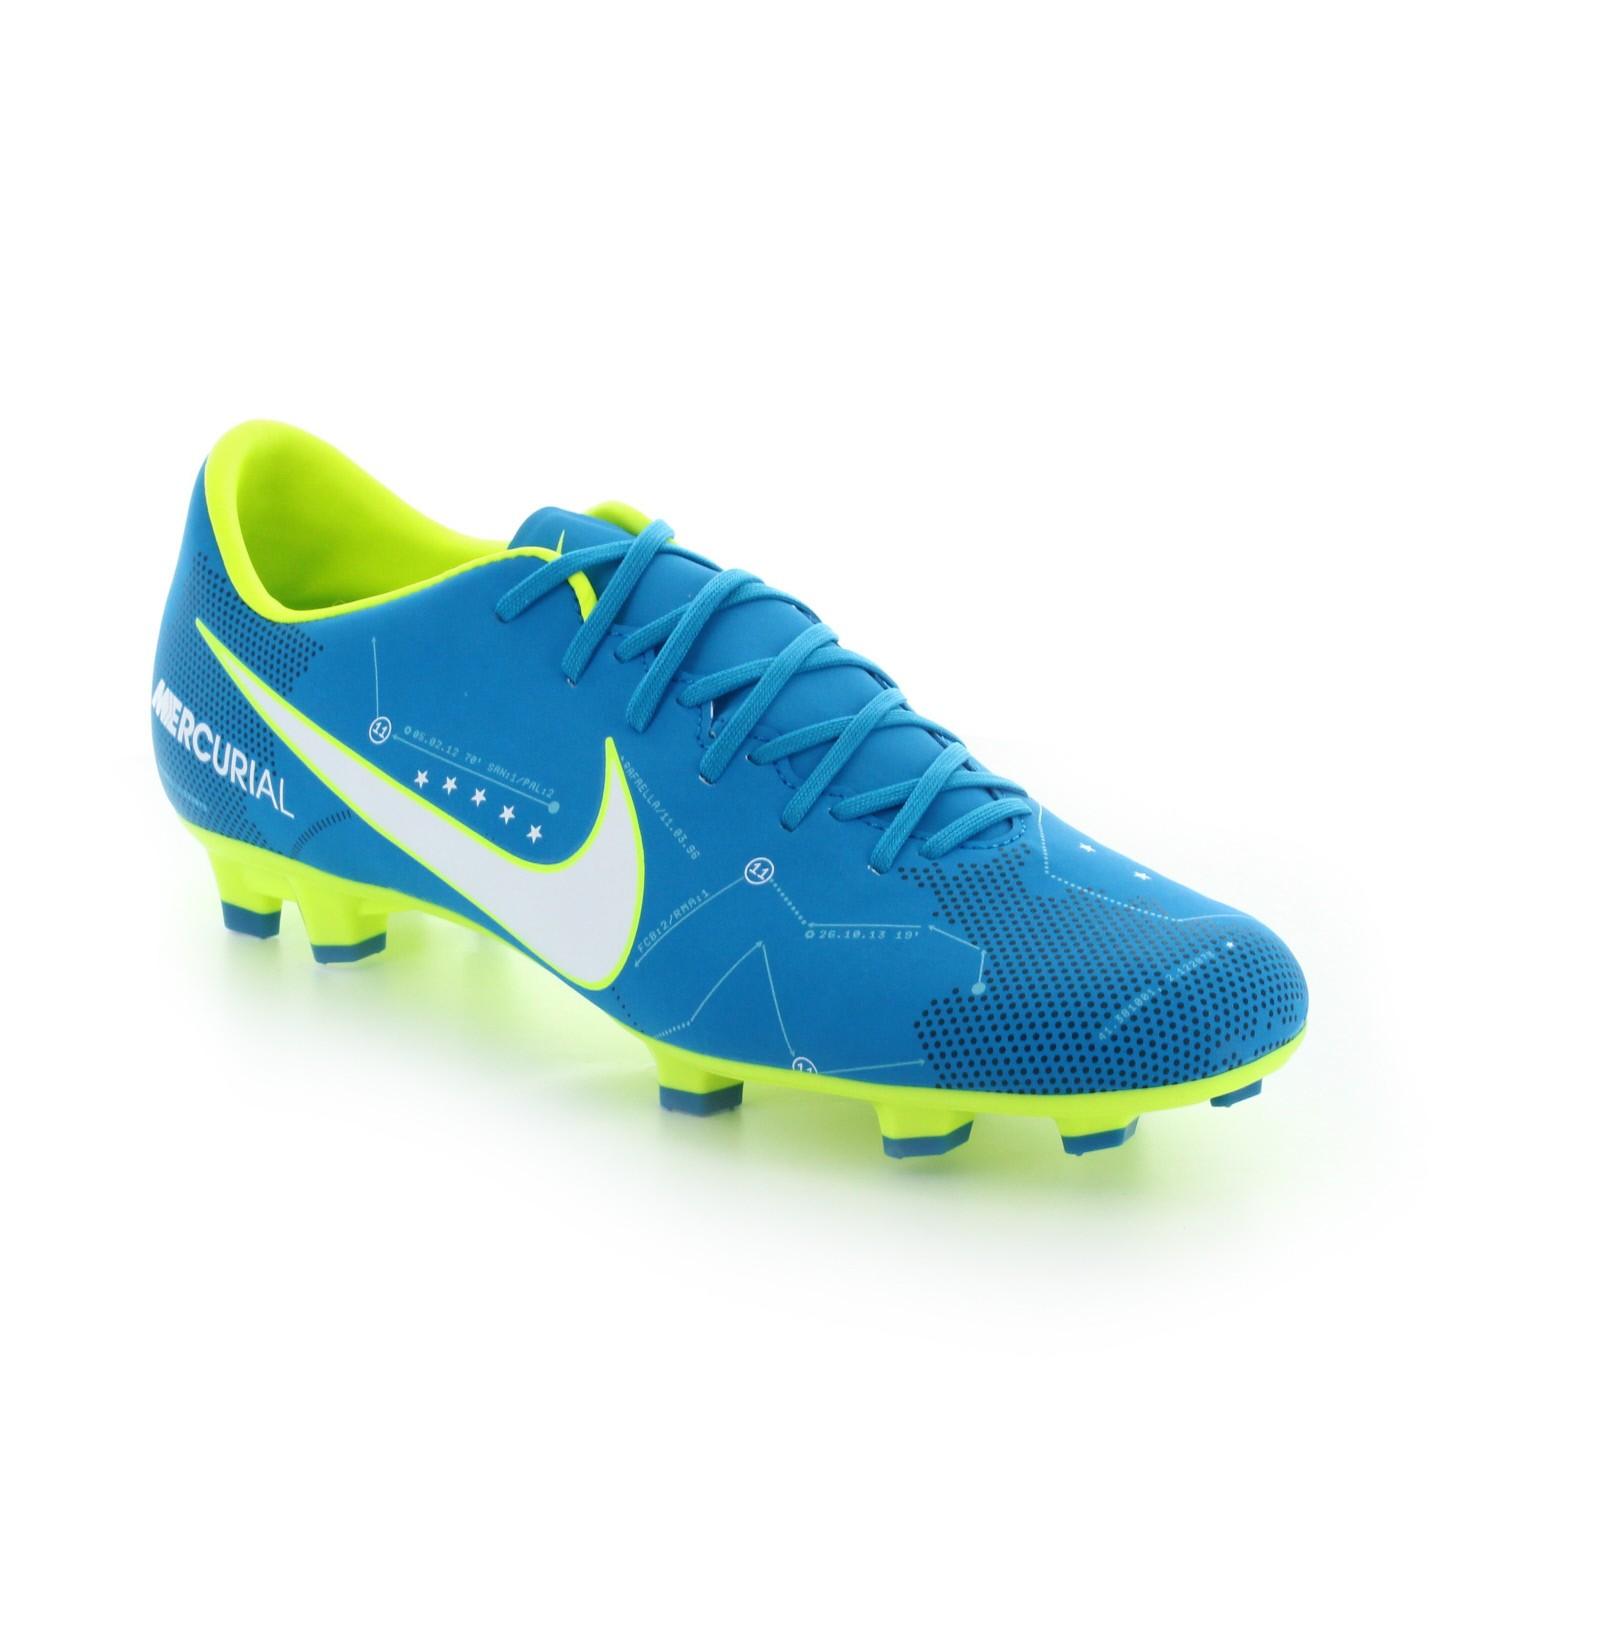 wholesale dealer 77993 54f71 Nike mercurial victory vi njr fg